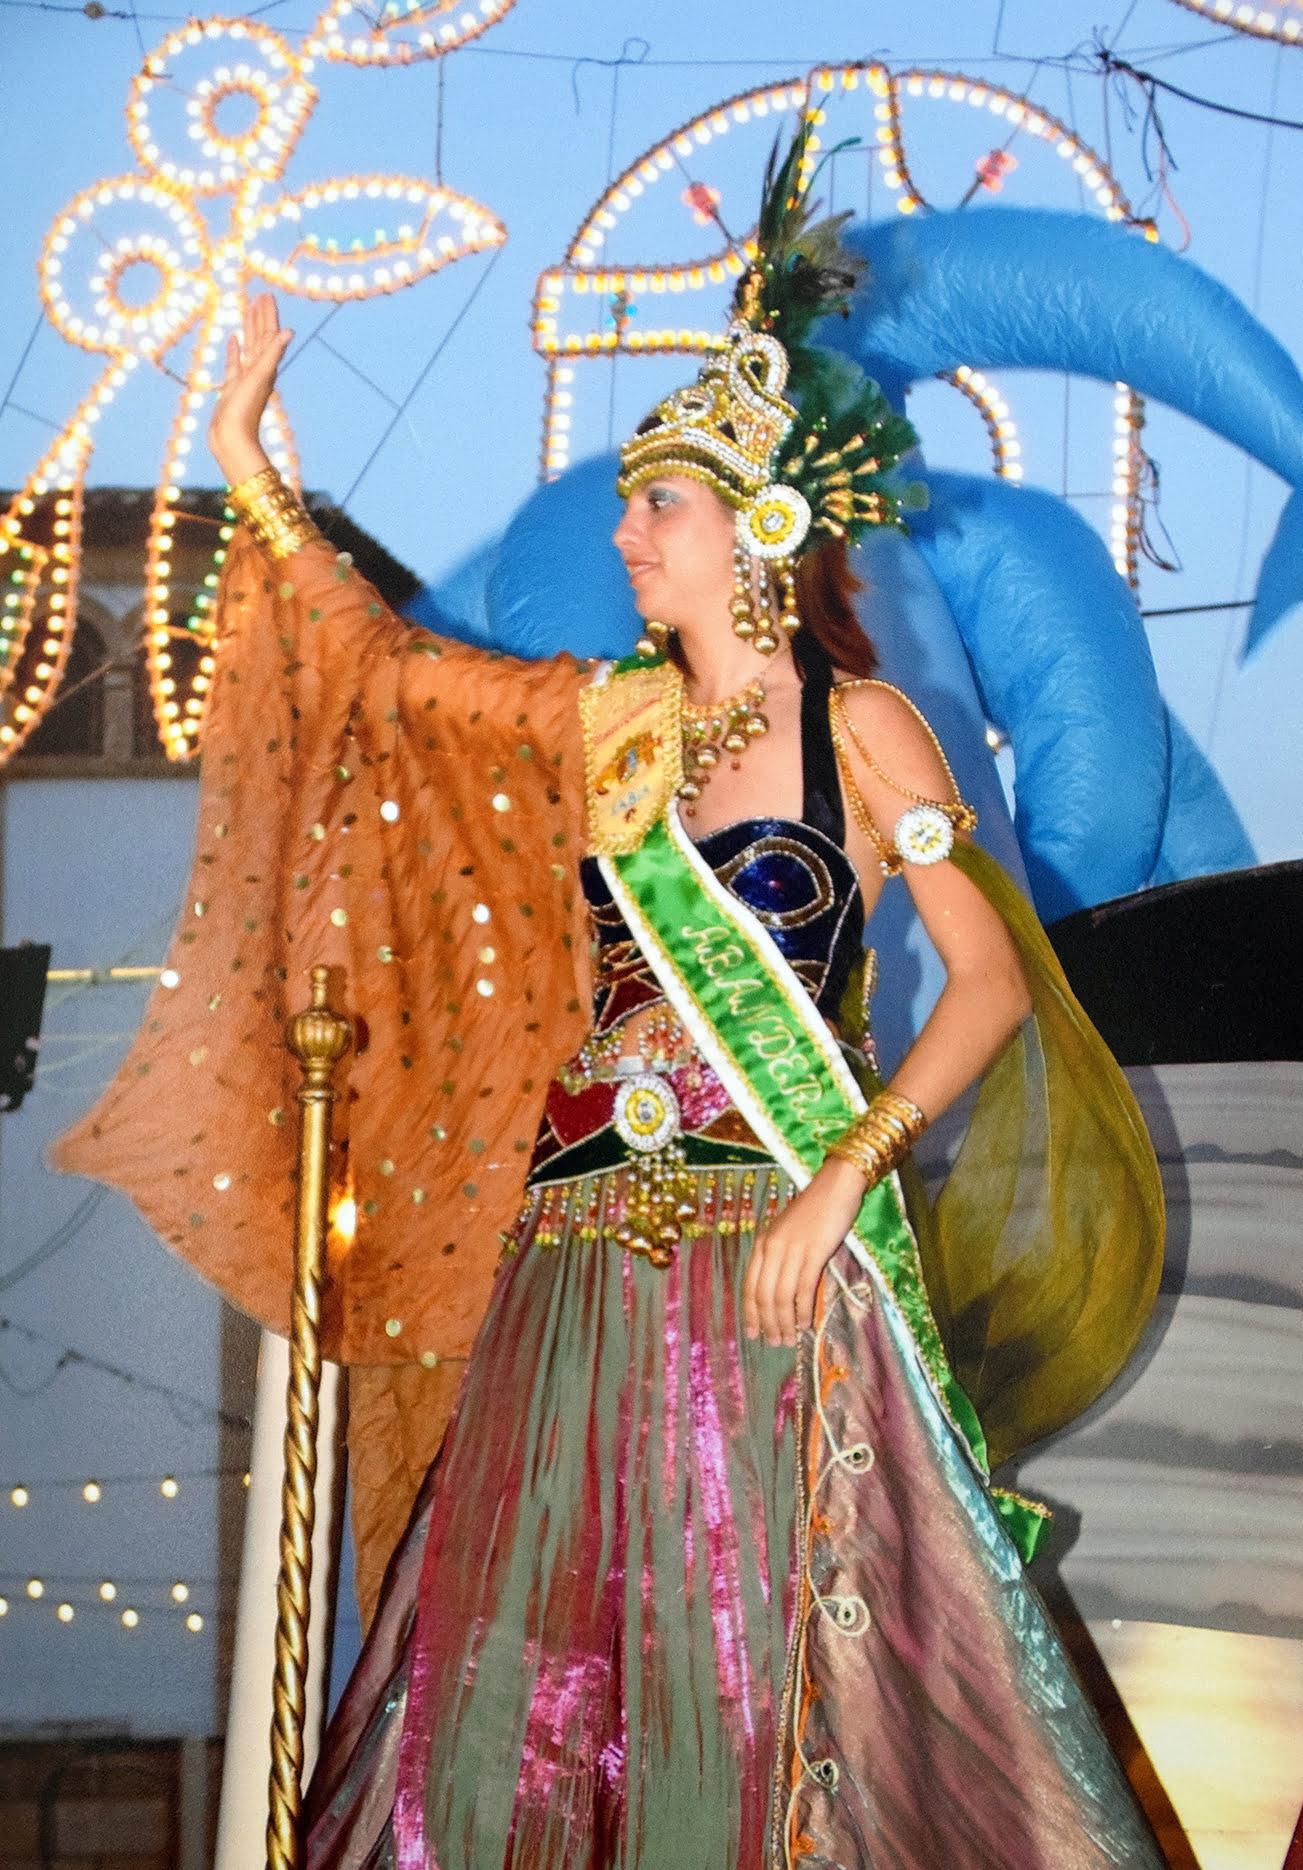 Miriam Monfort – Abanderada Mora 2007